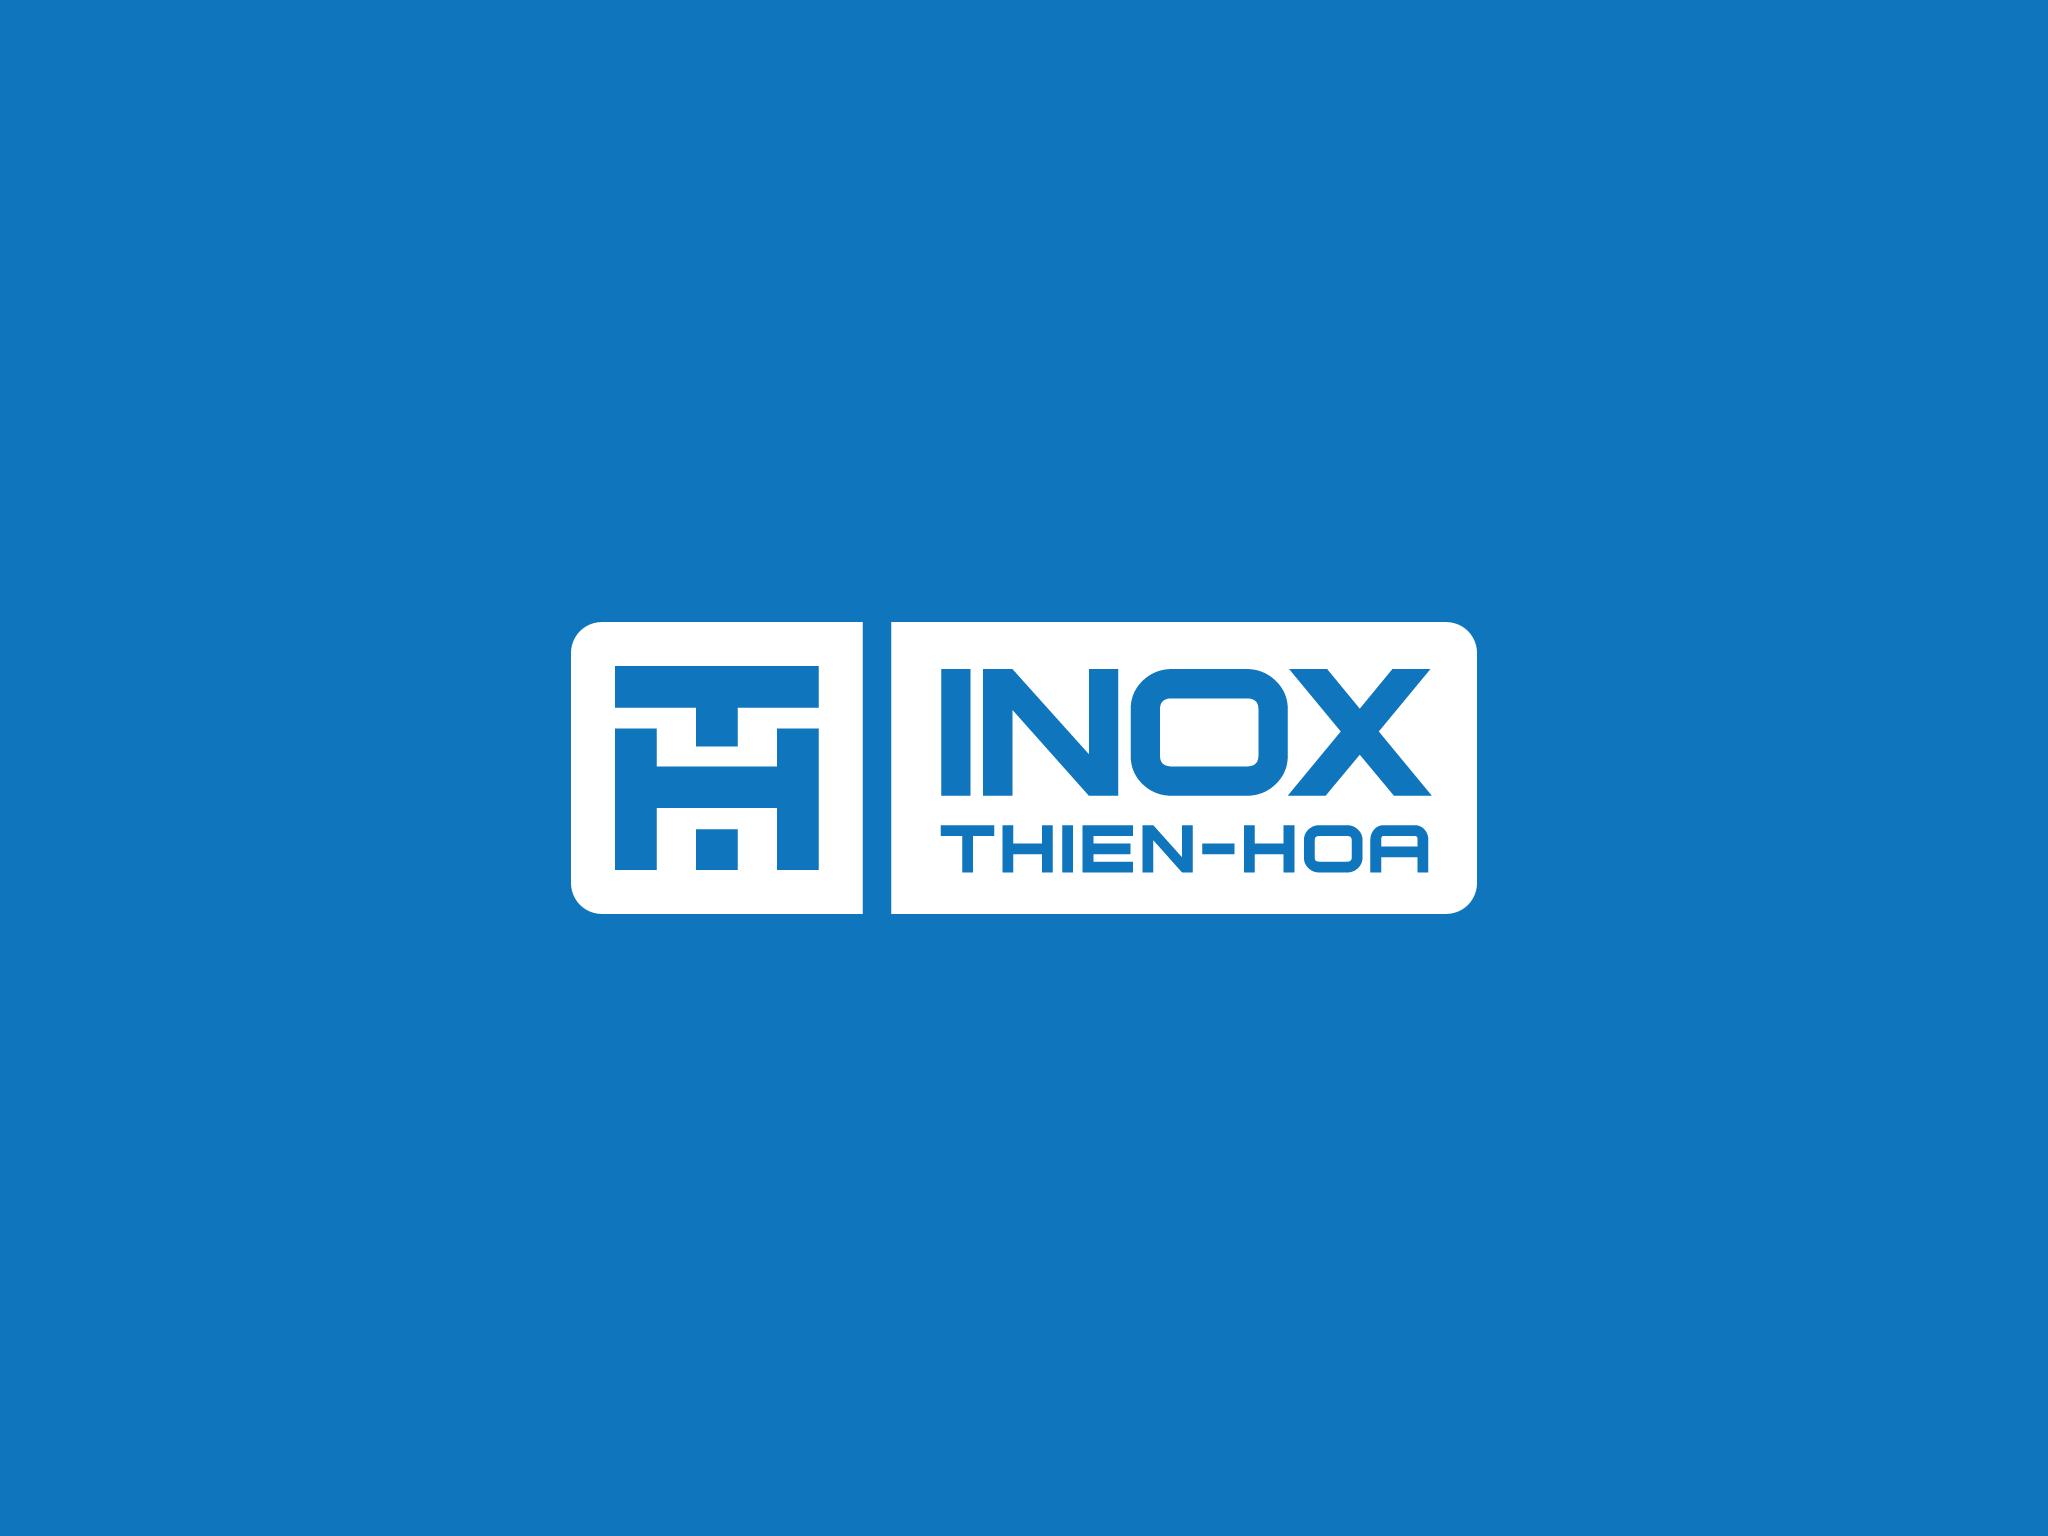 Logo Inox Thiên Hòa